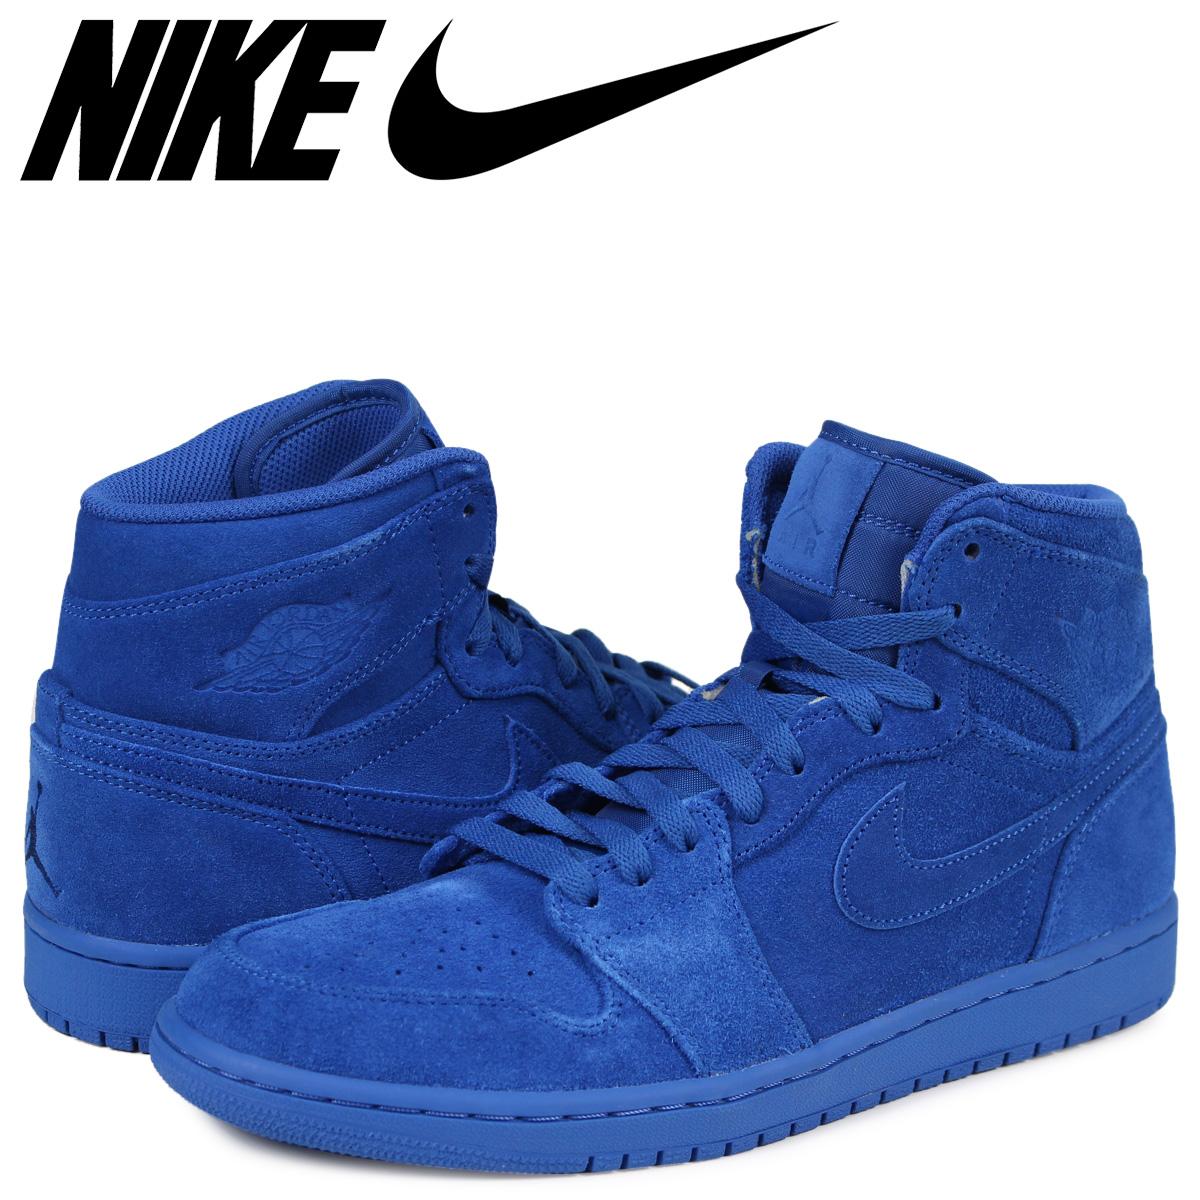 651708c9052 SneaK Online Shop: Nike NIKE Air Jordan 1 nostalgic high sneakers ...